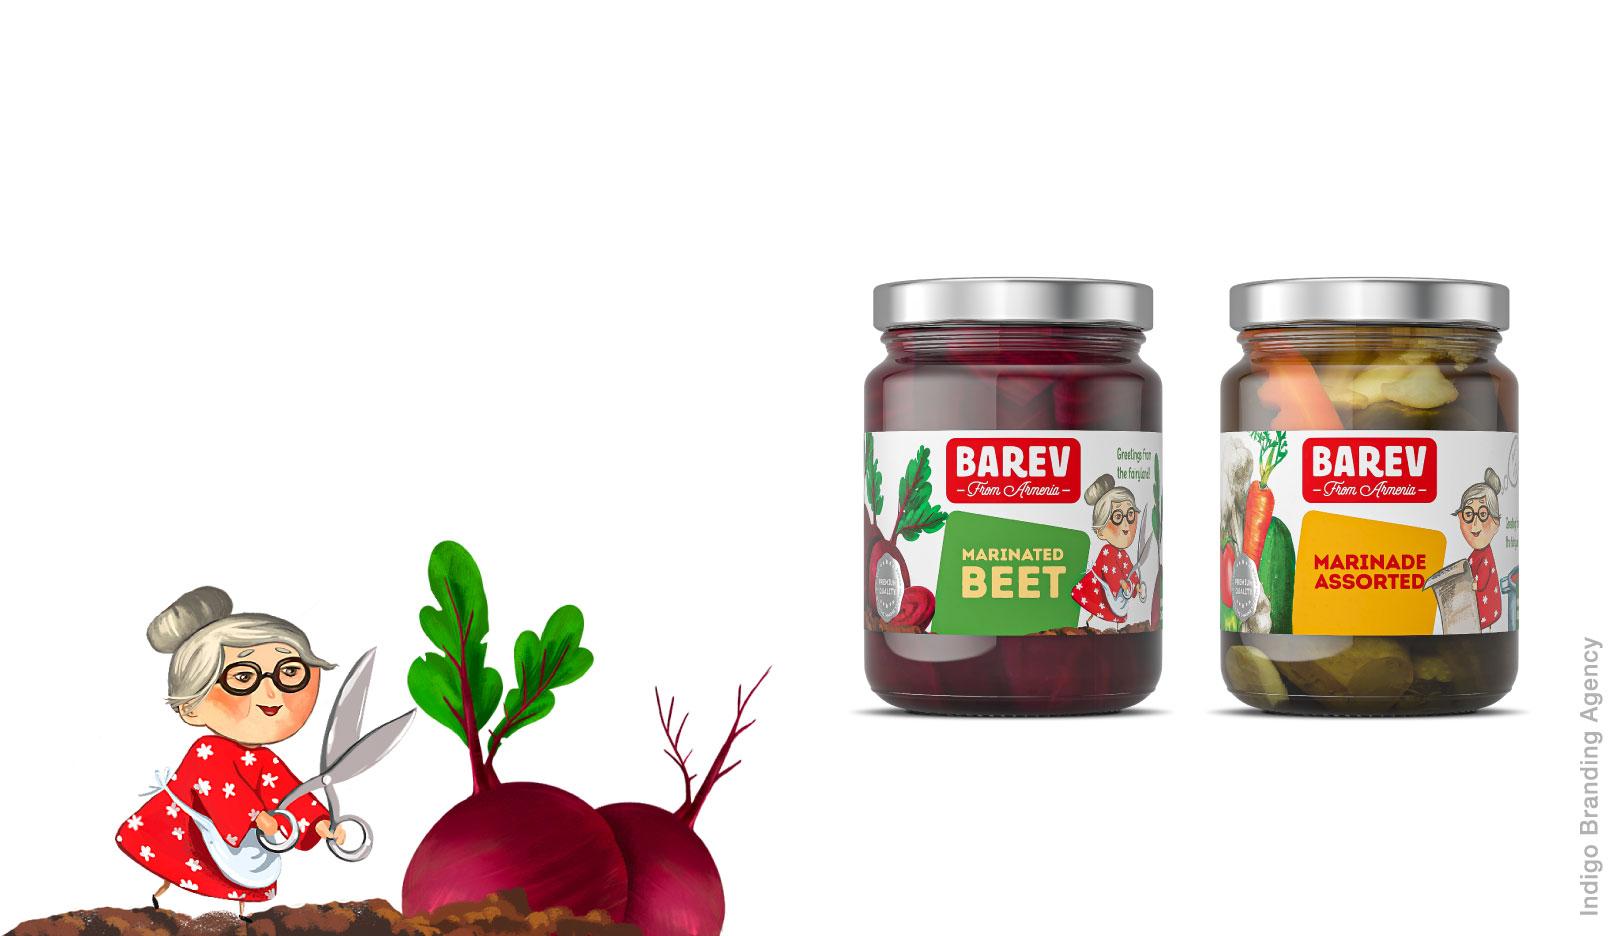 Barev Armenia jams preserves juices branding and packaging design for Hayasy Group by Indigo Branding